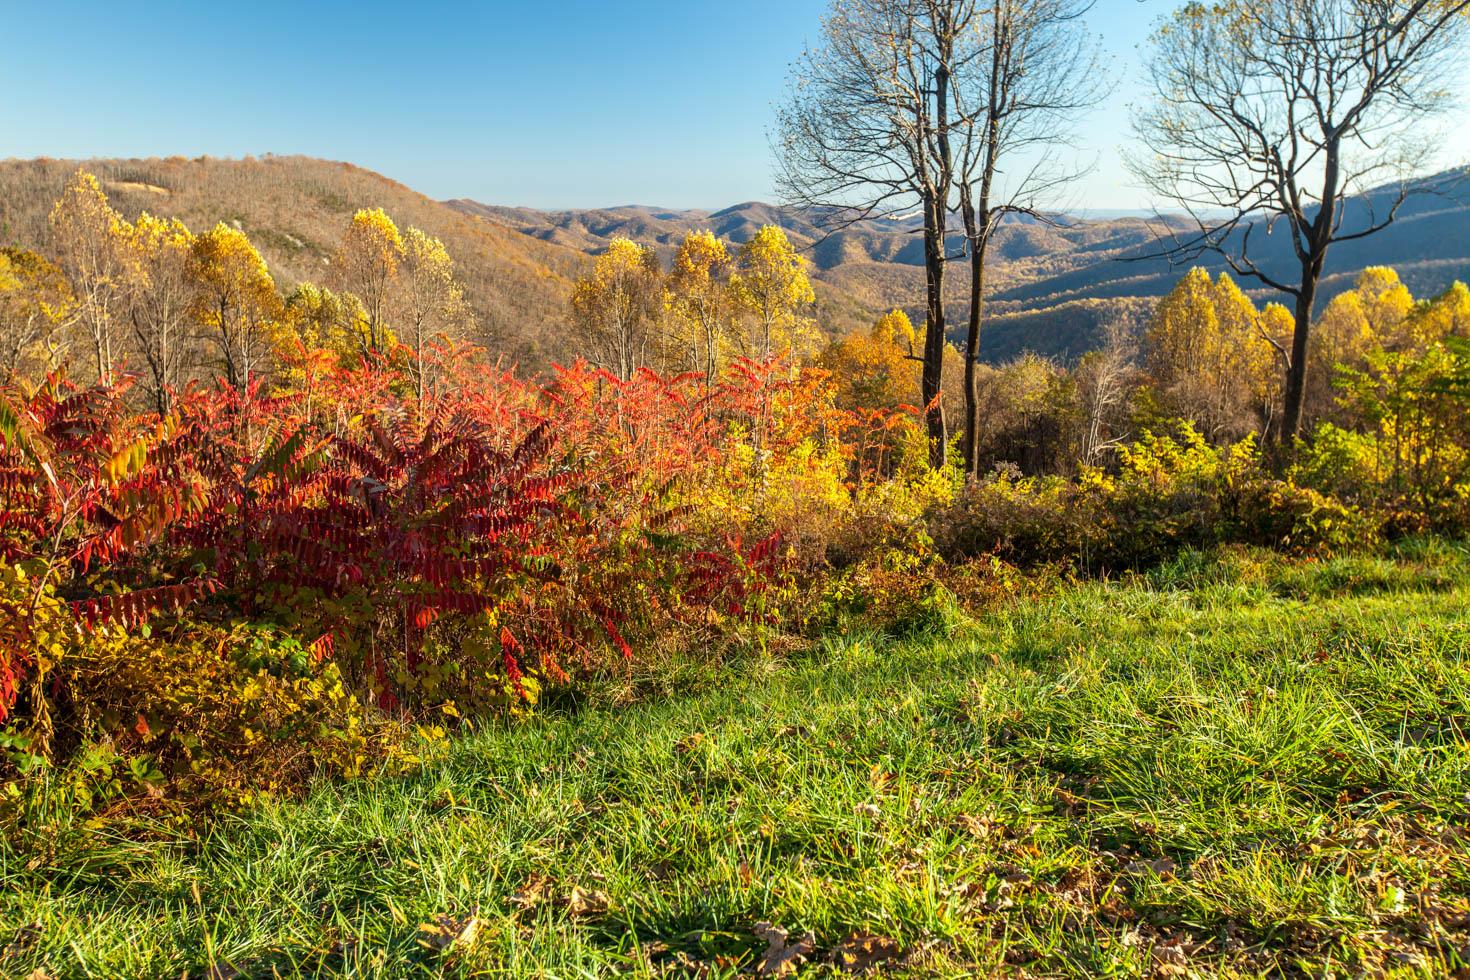 Skyline Drive, Shenandoah National Park, Blue Ridge Mountains, Virginia #vezzaniphotography